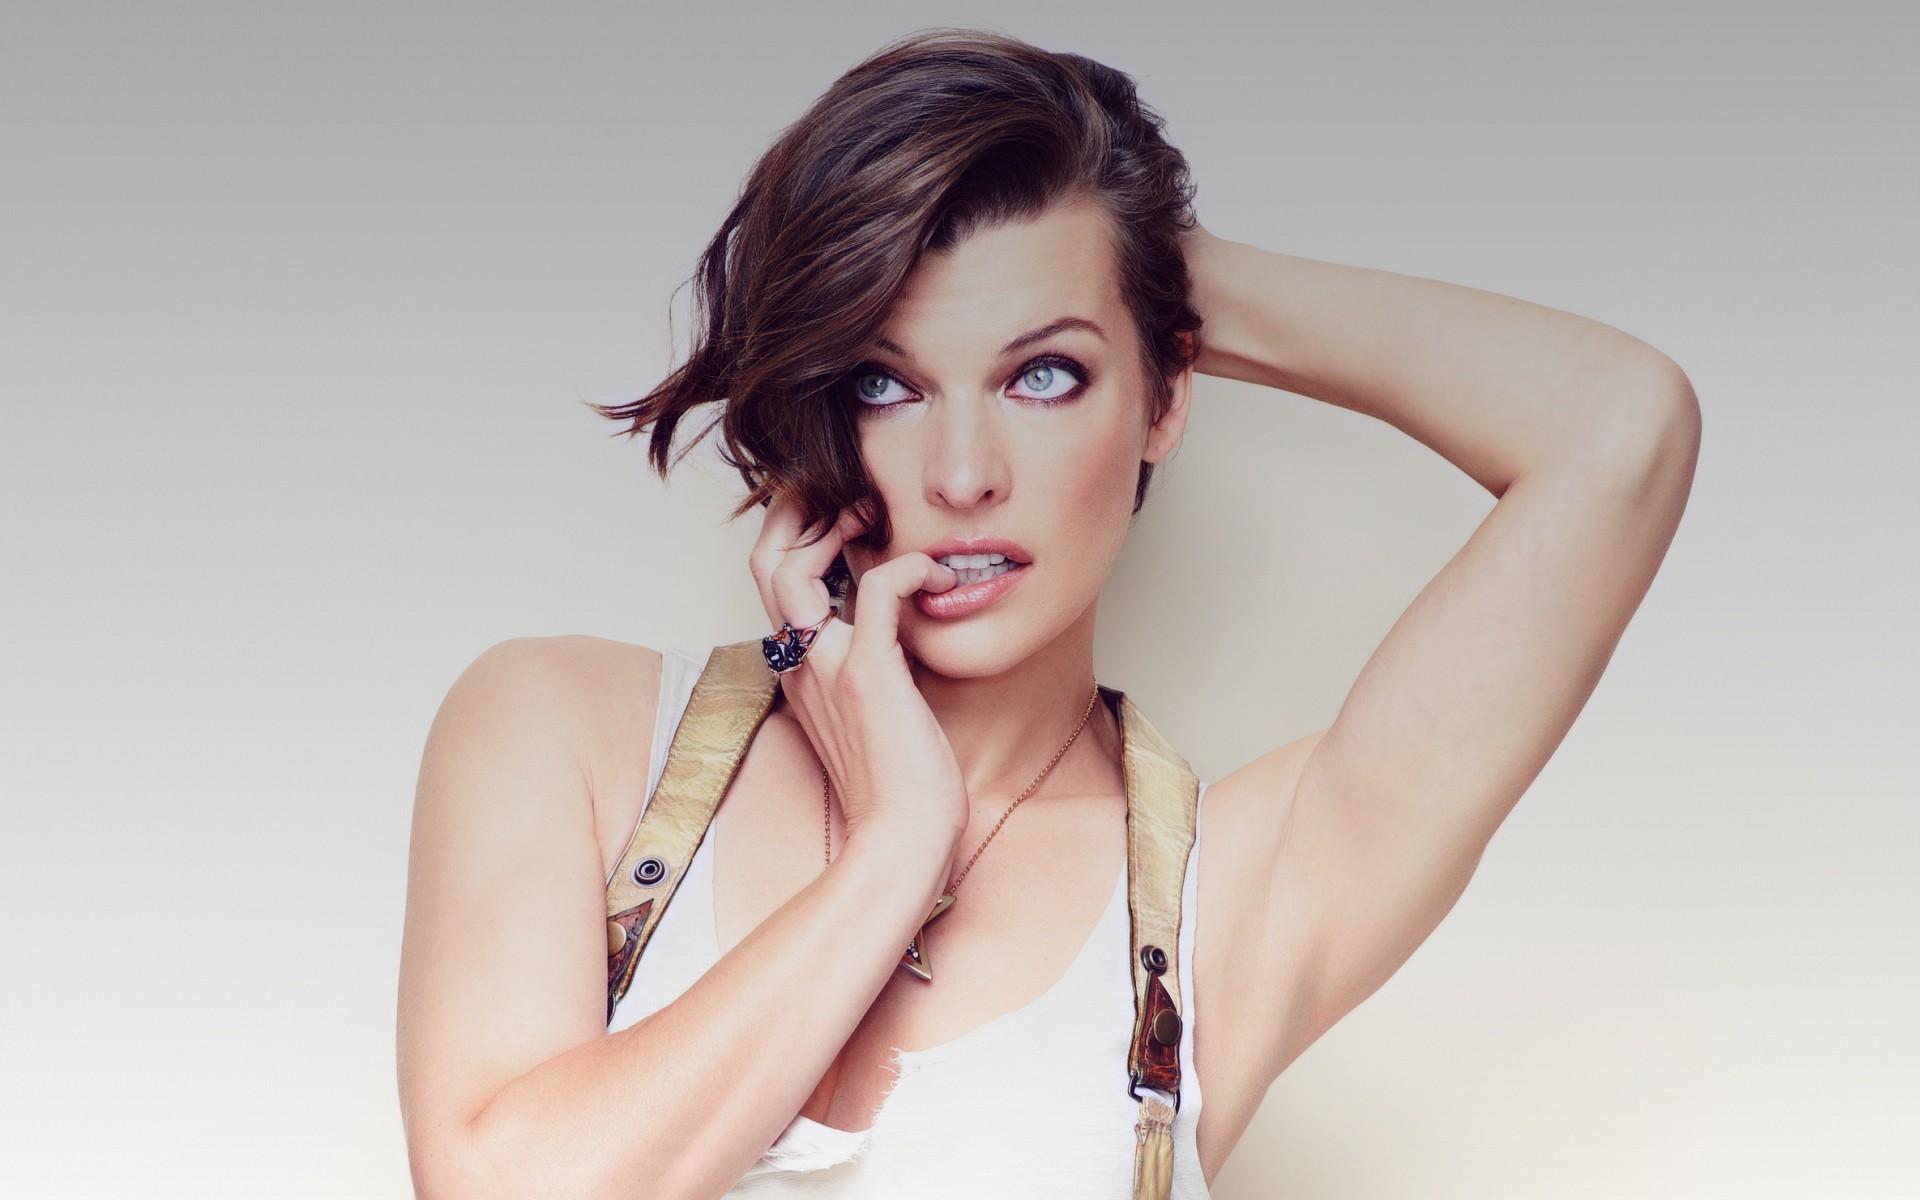 Milla jovovich 2016 hd celebrities 4k wallpapers images - Milla jovovich 4k wallpaper ...